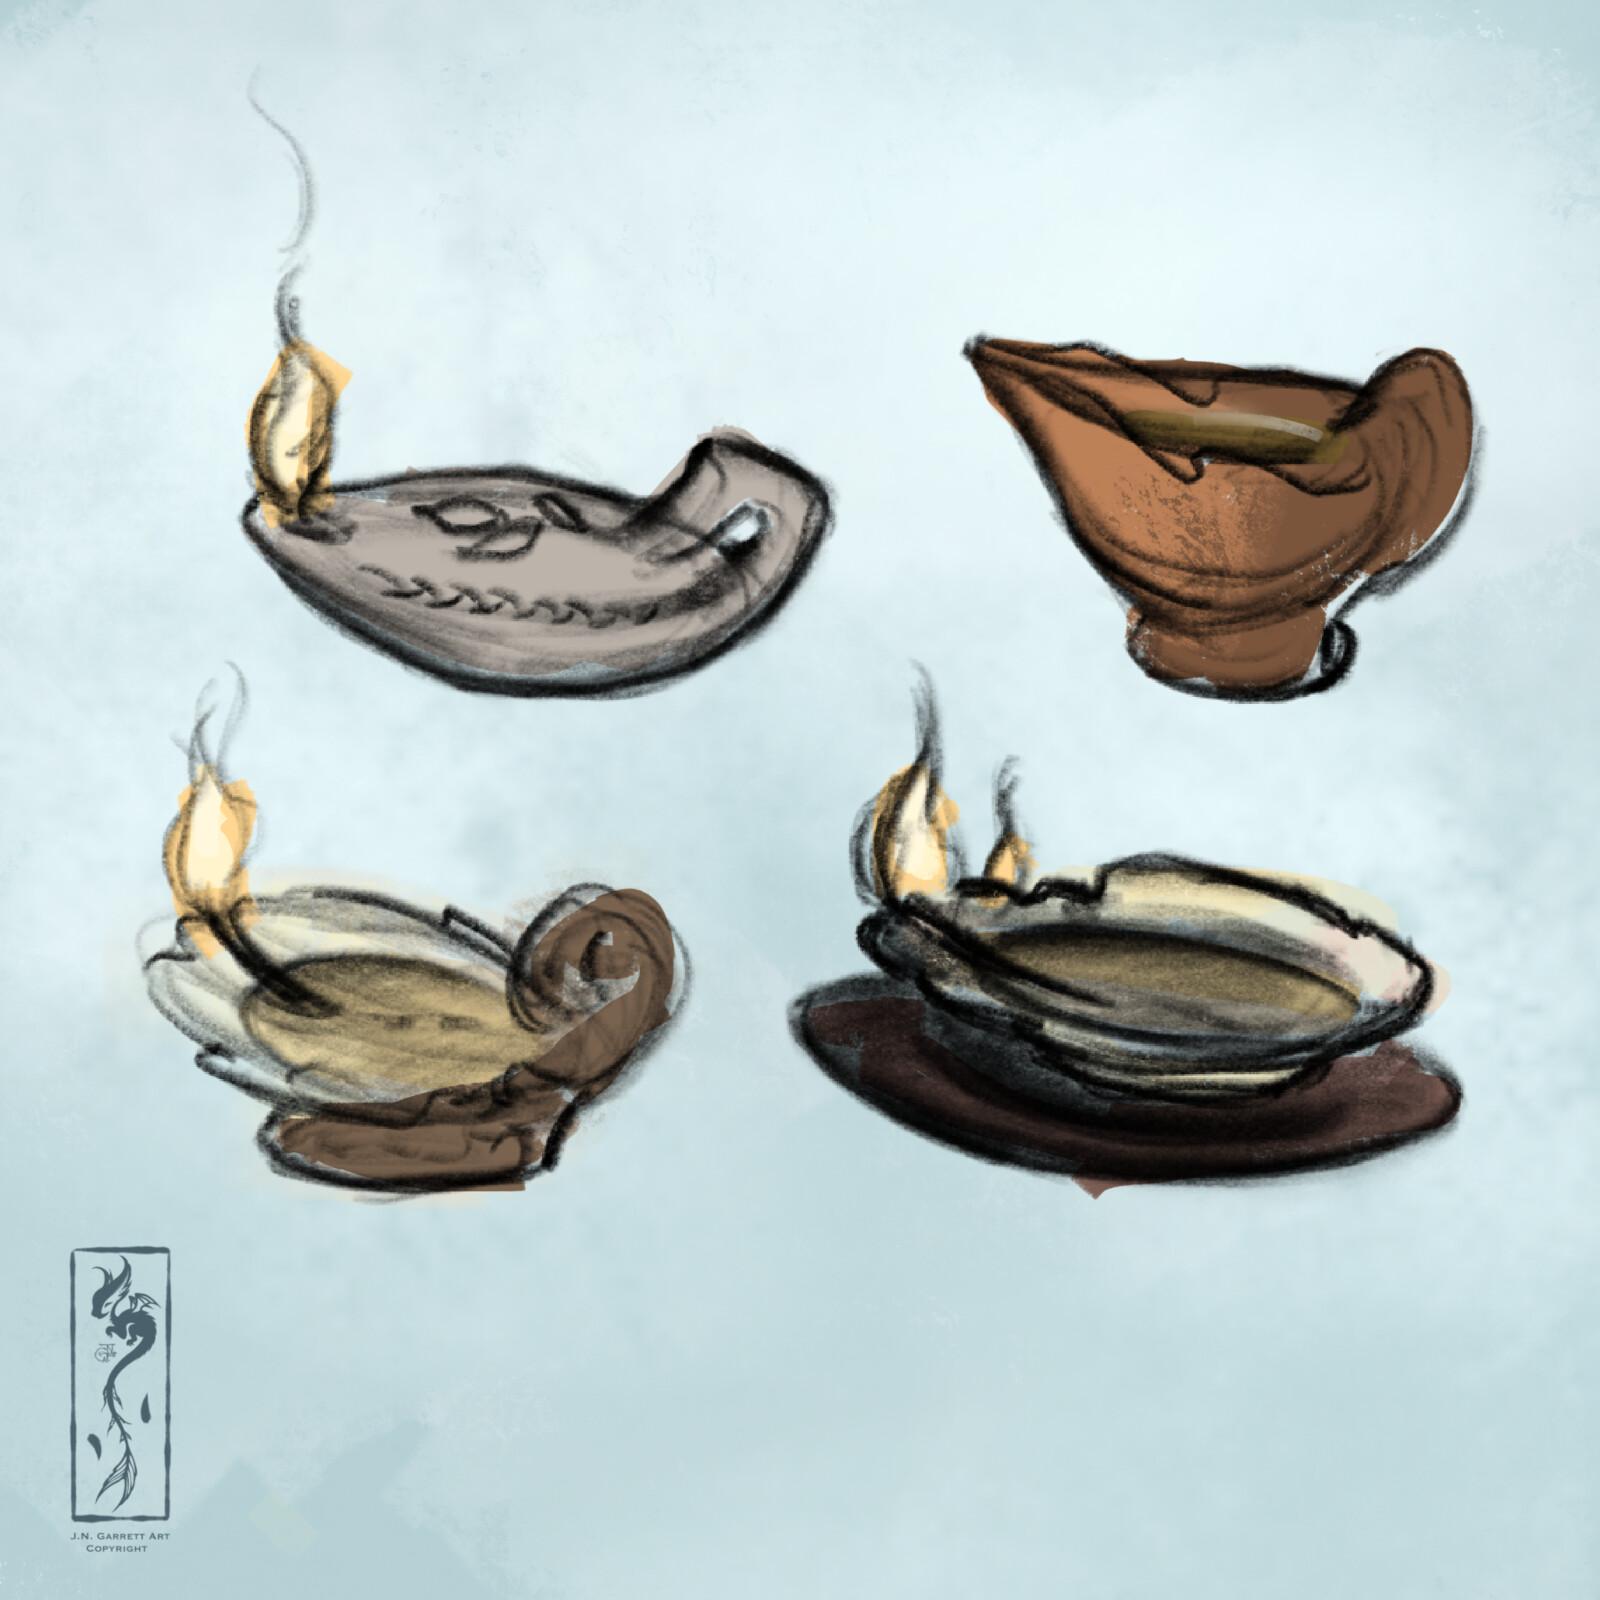 Oil Lamp Concepts